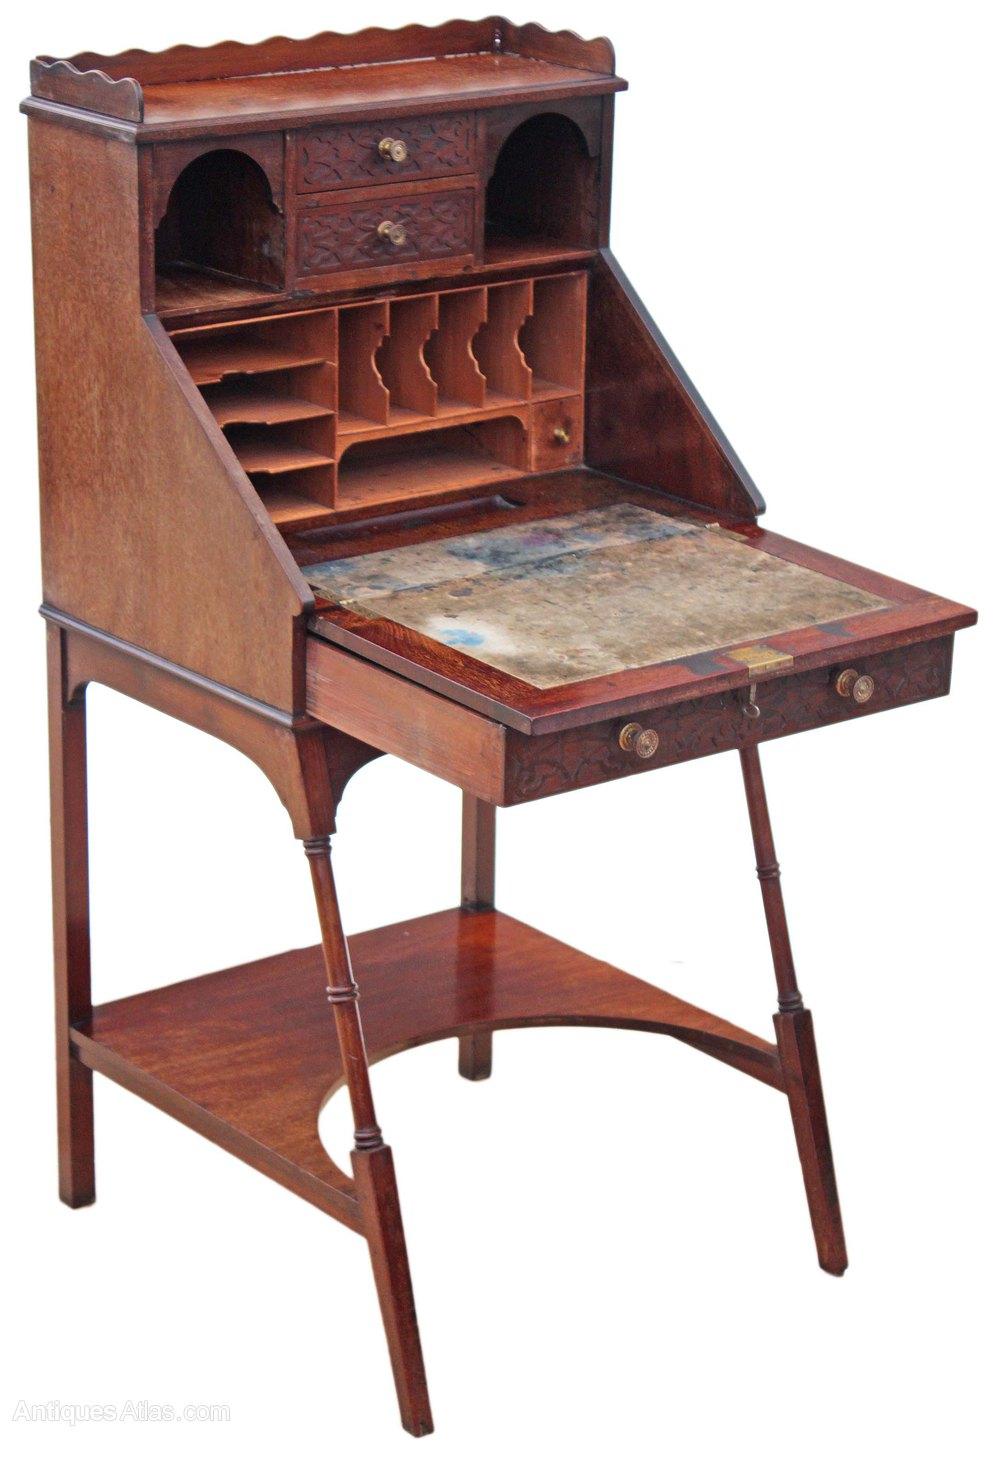 edwardian mahogany ladies writing desk bureau table antiques atlas. Black Bedroom Furniture Sets. Home Design Ideas